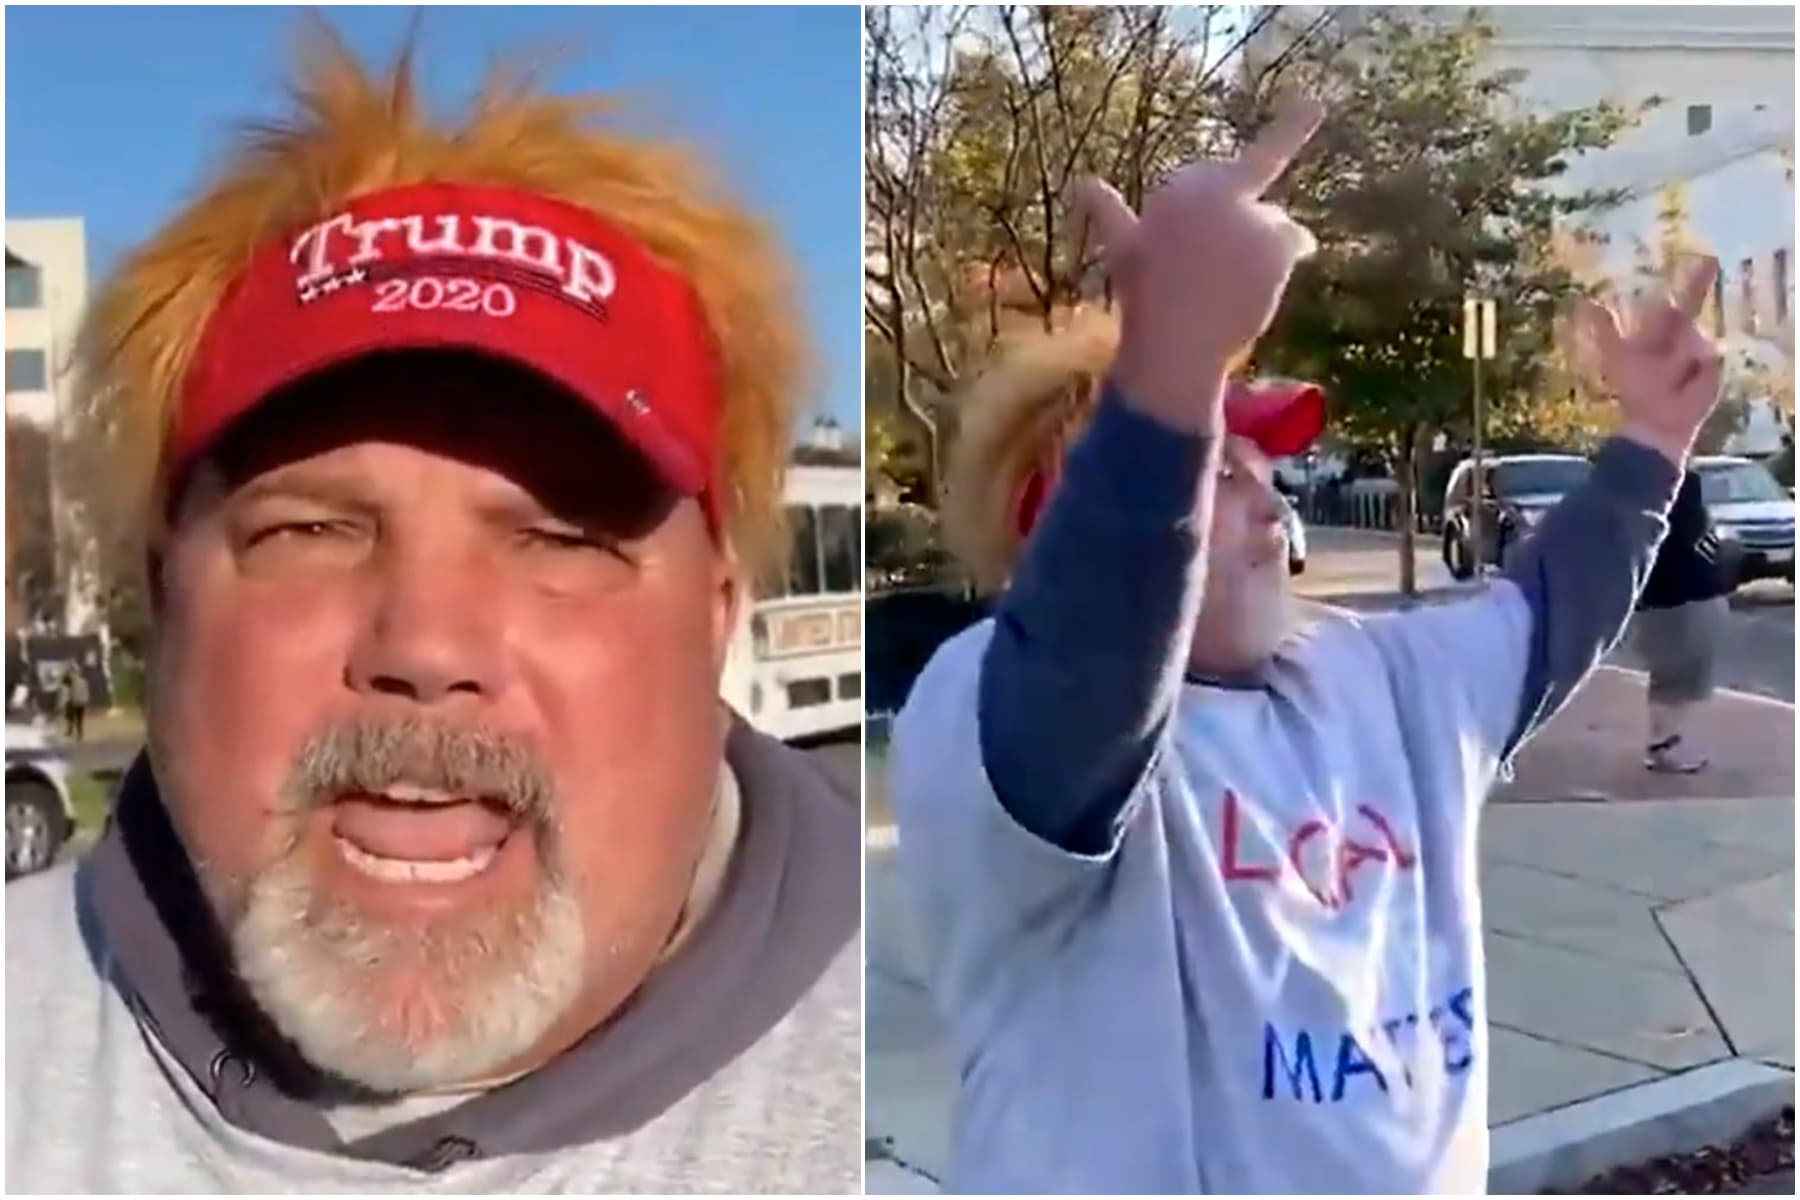 Trump, maga, dc, march, anti-gay, slur, protest